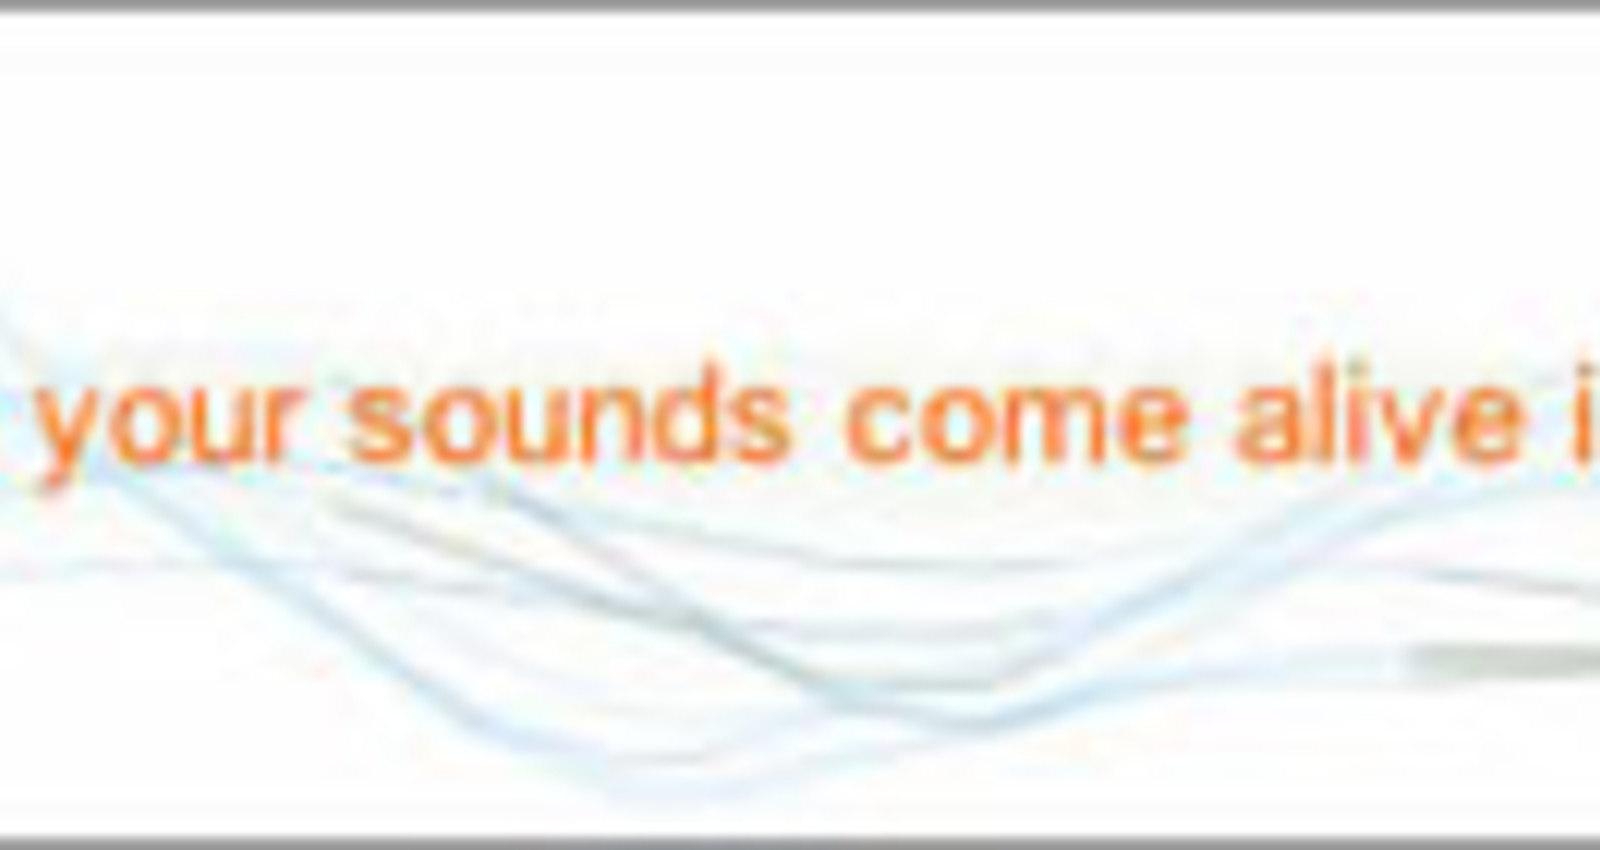 FTD+hp Bouquet Banner, Bang amp; Olufsen+hp Voice Visualizer Banner, Bang amp; Olufsen+hp Light Banner